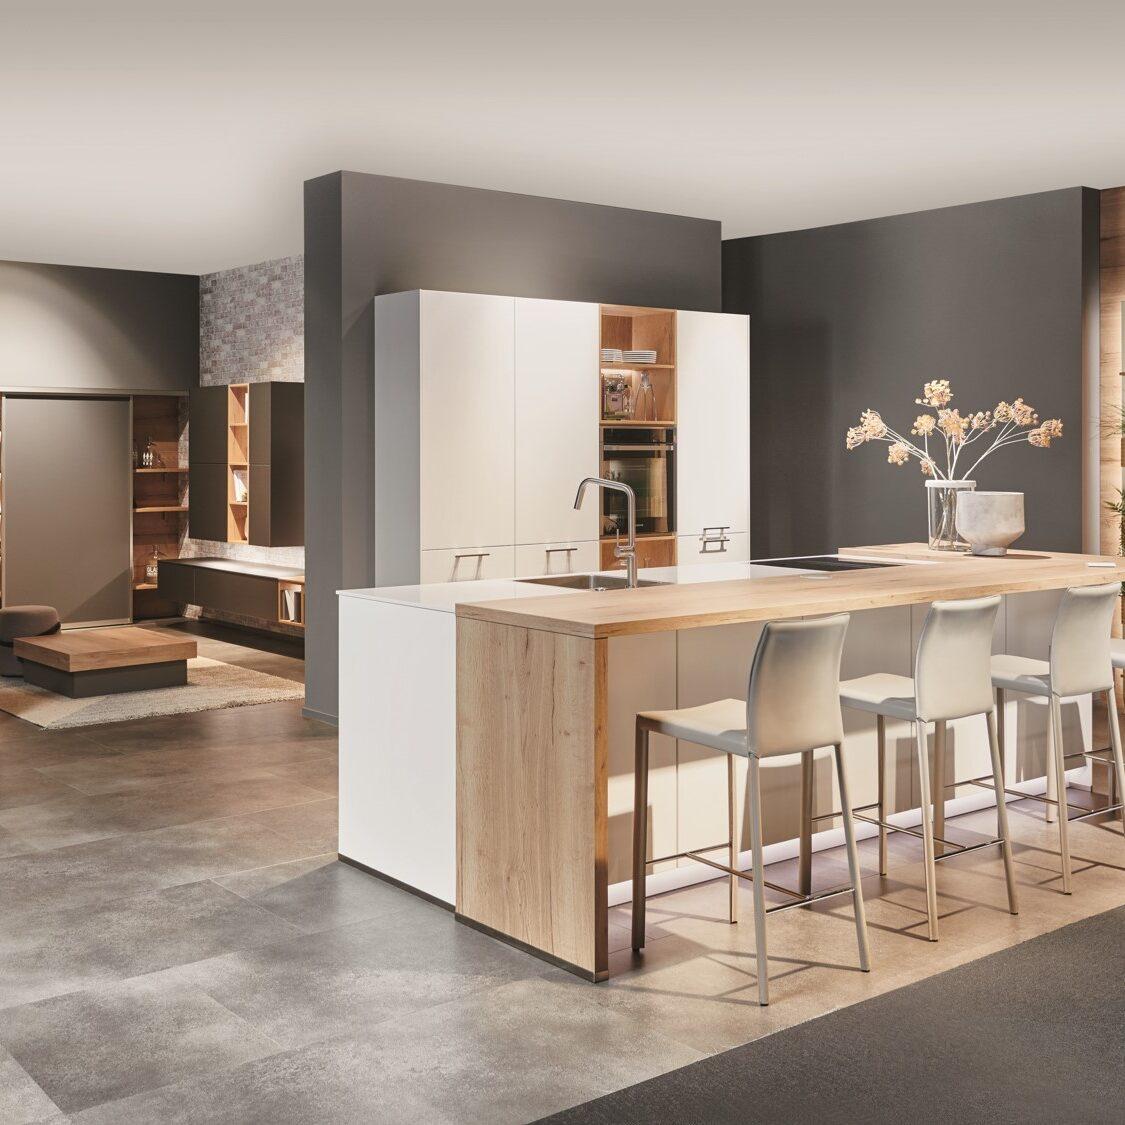 kitchens nobilia beirut